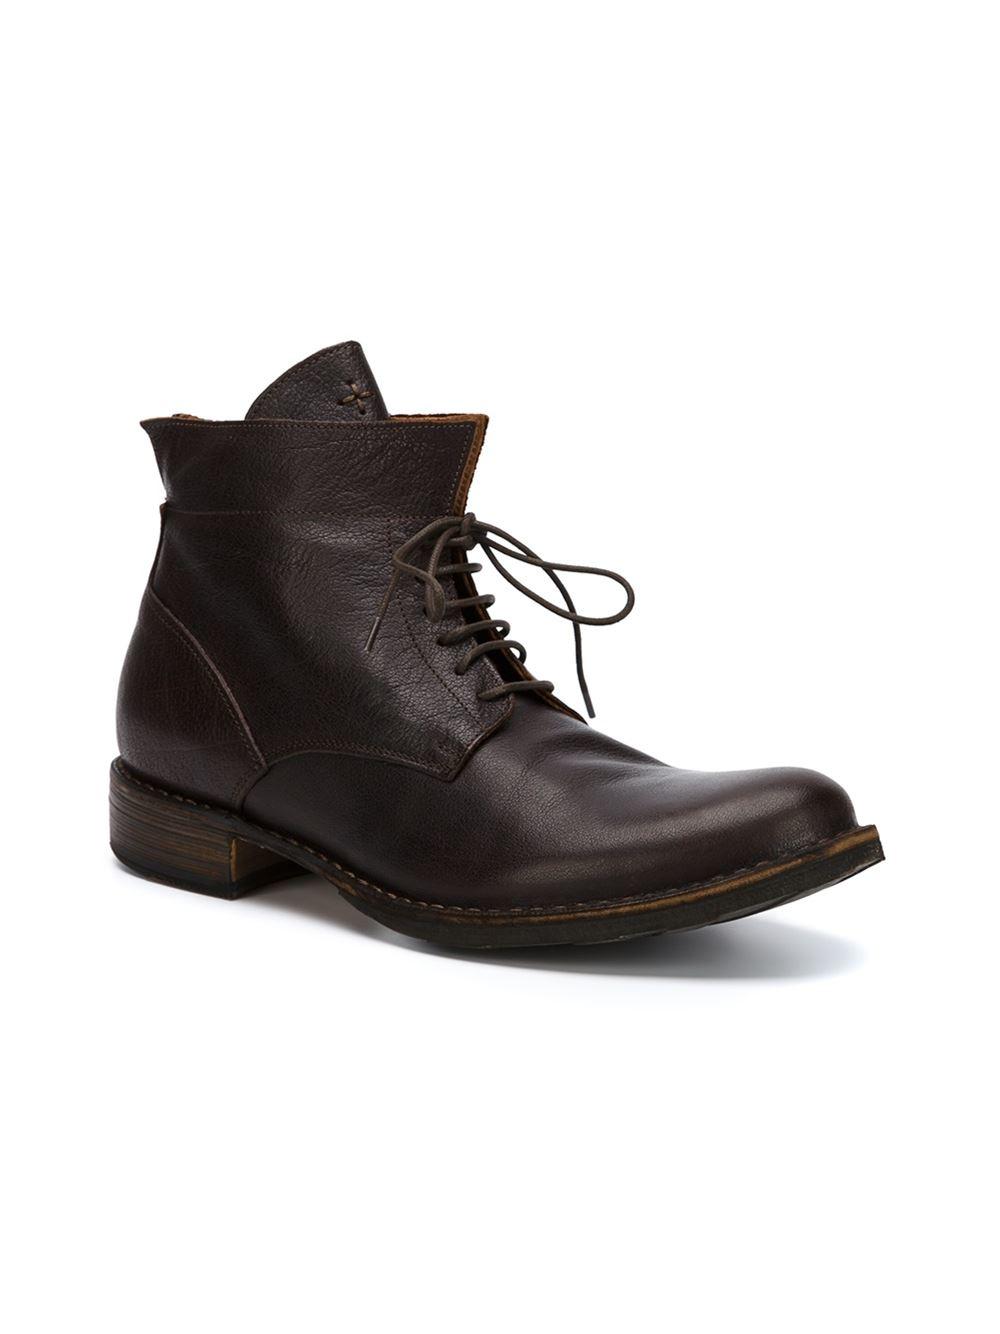 fiorentini baker 39 eternity 39 boots in brown for men lyst. Black Bedroom Furniture Sets. Home Design Ideas